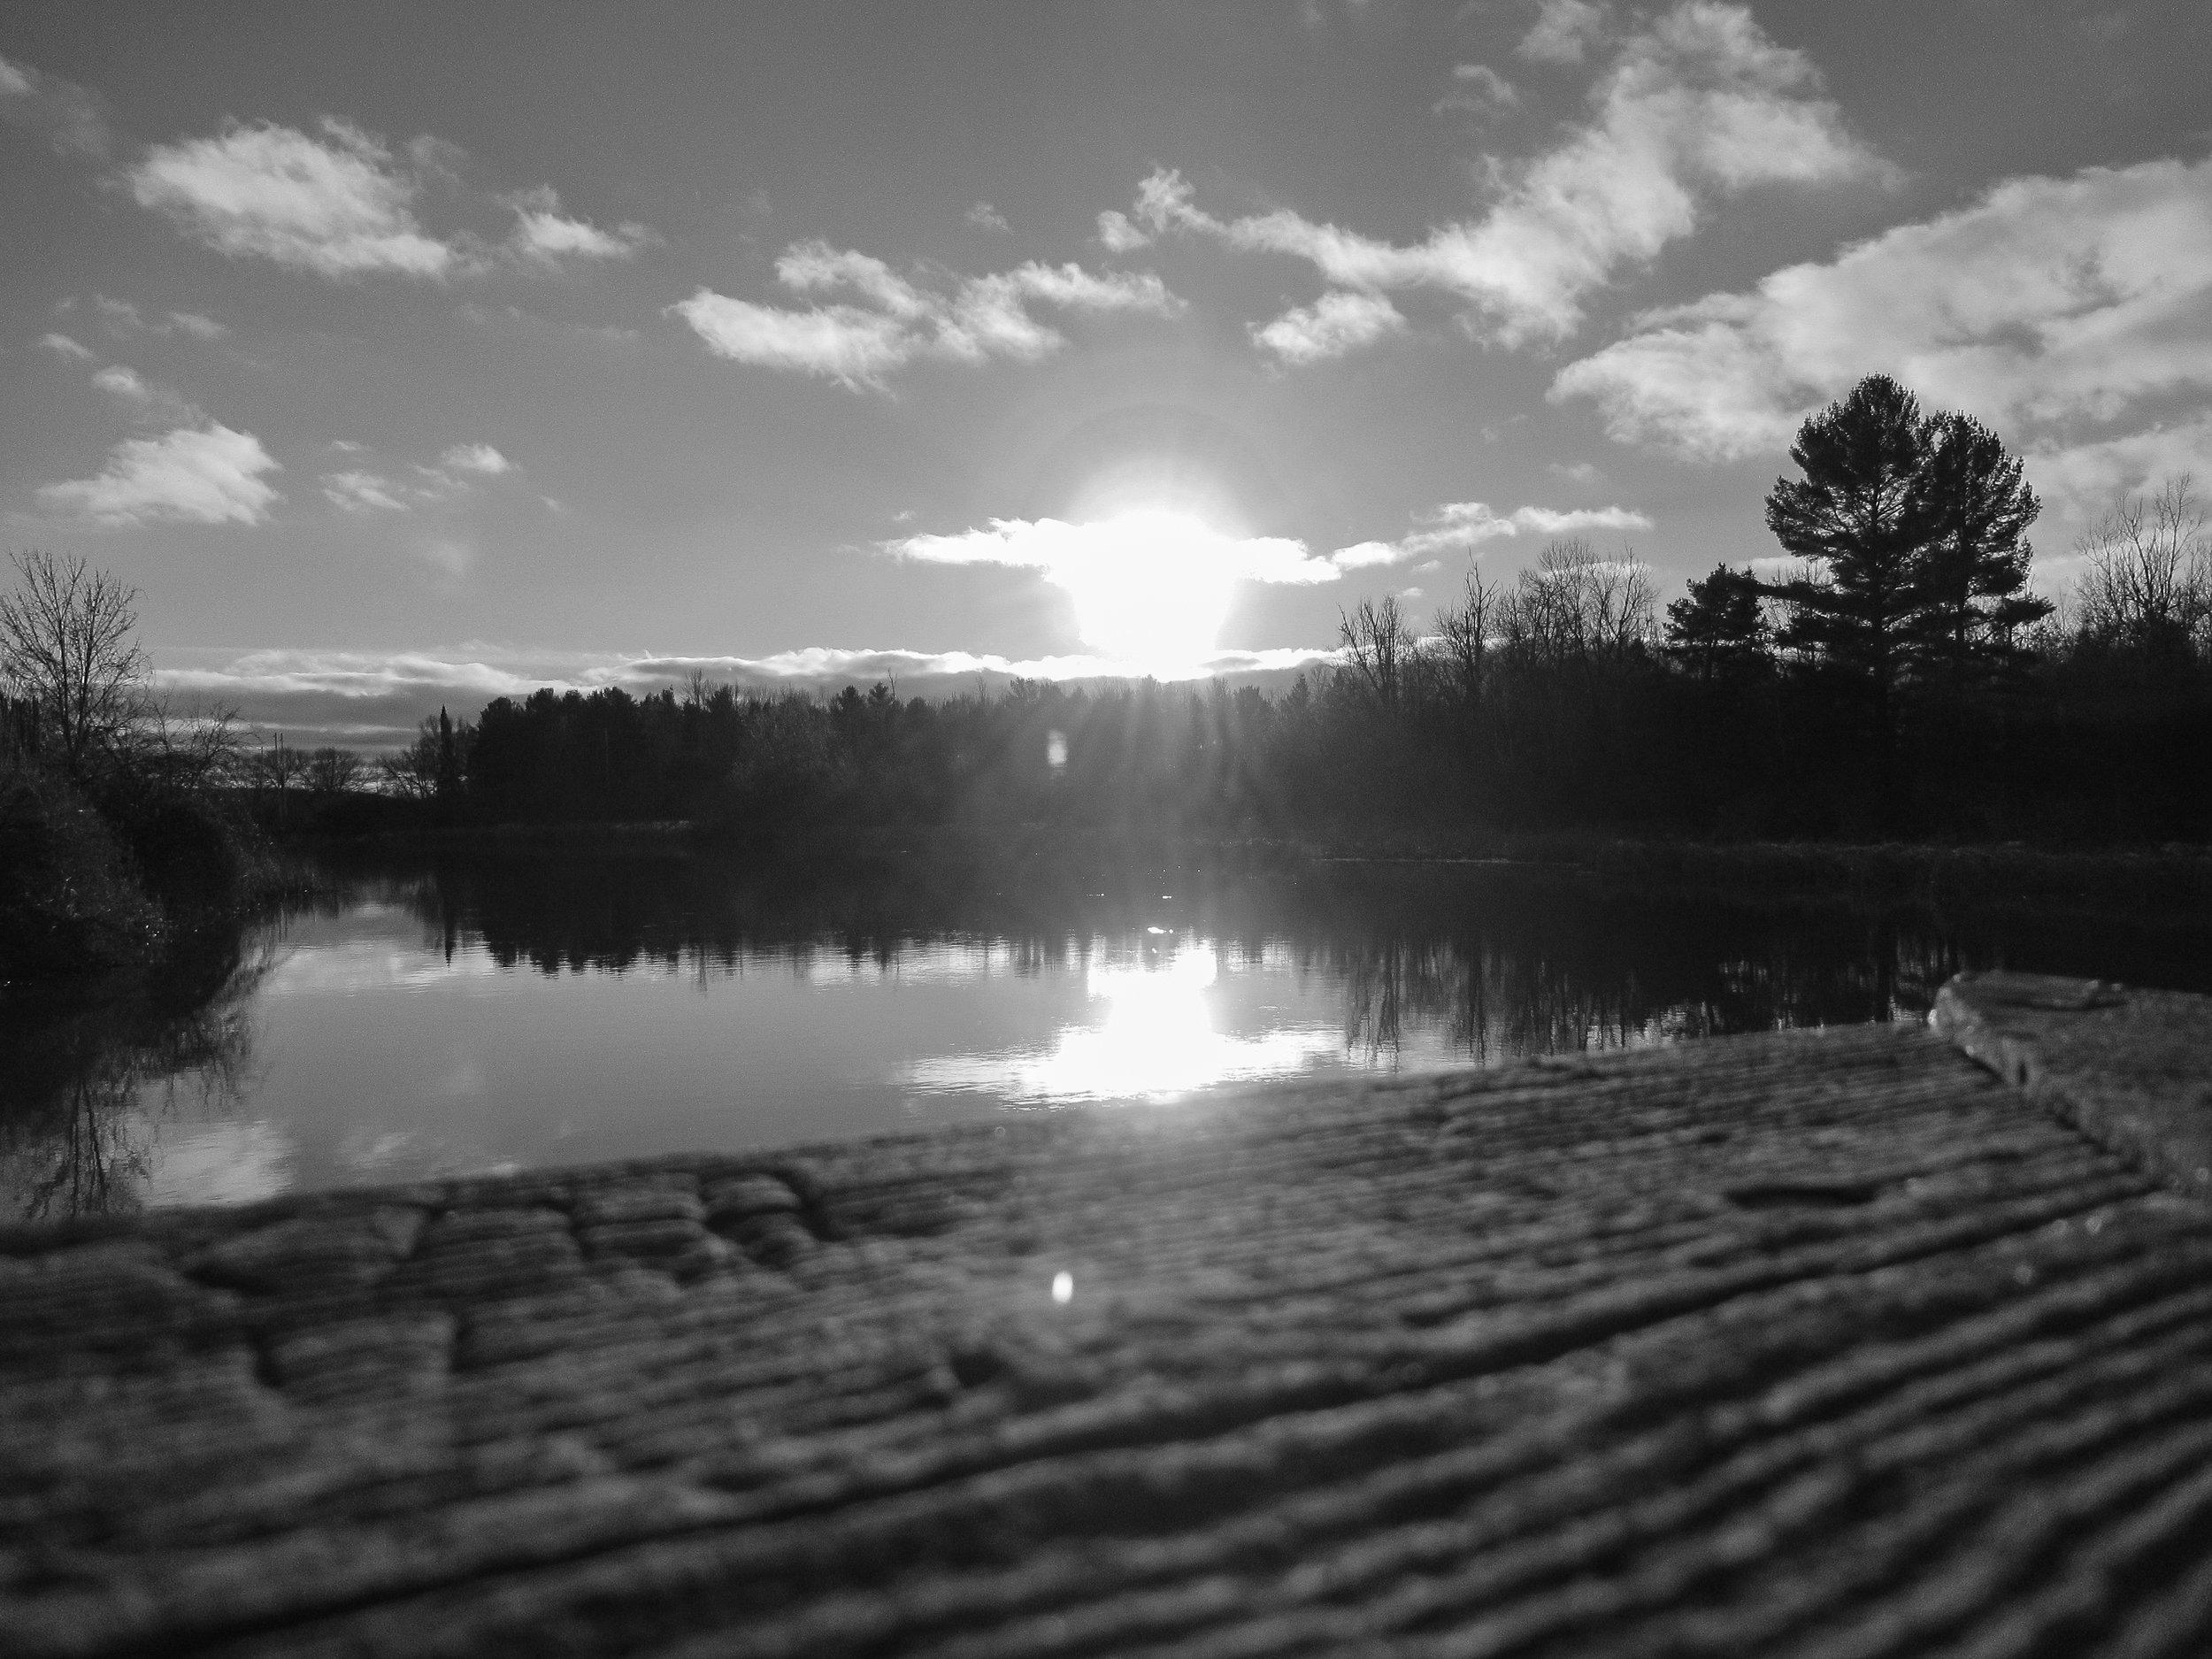 Water Sunset BW.jpg